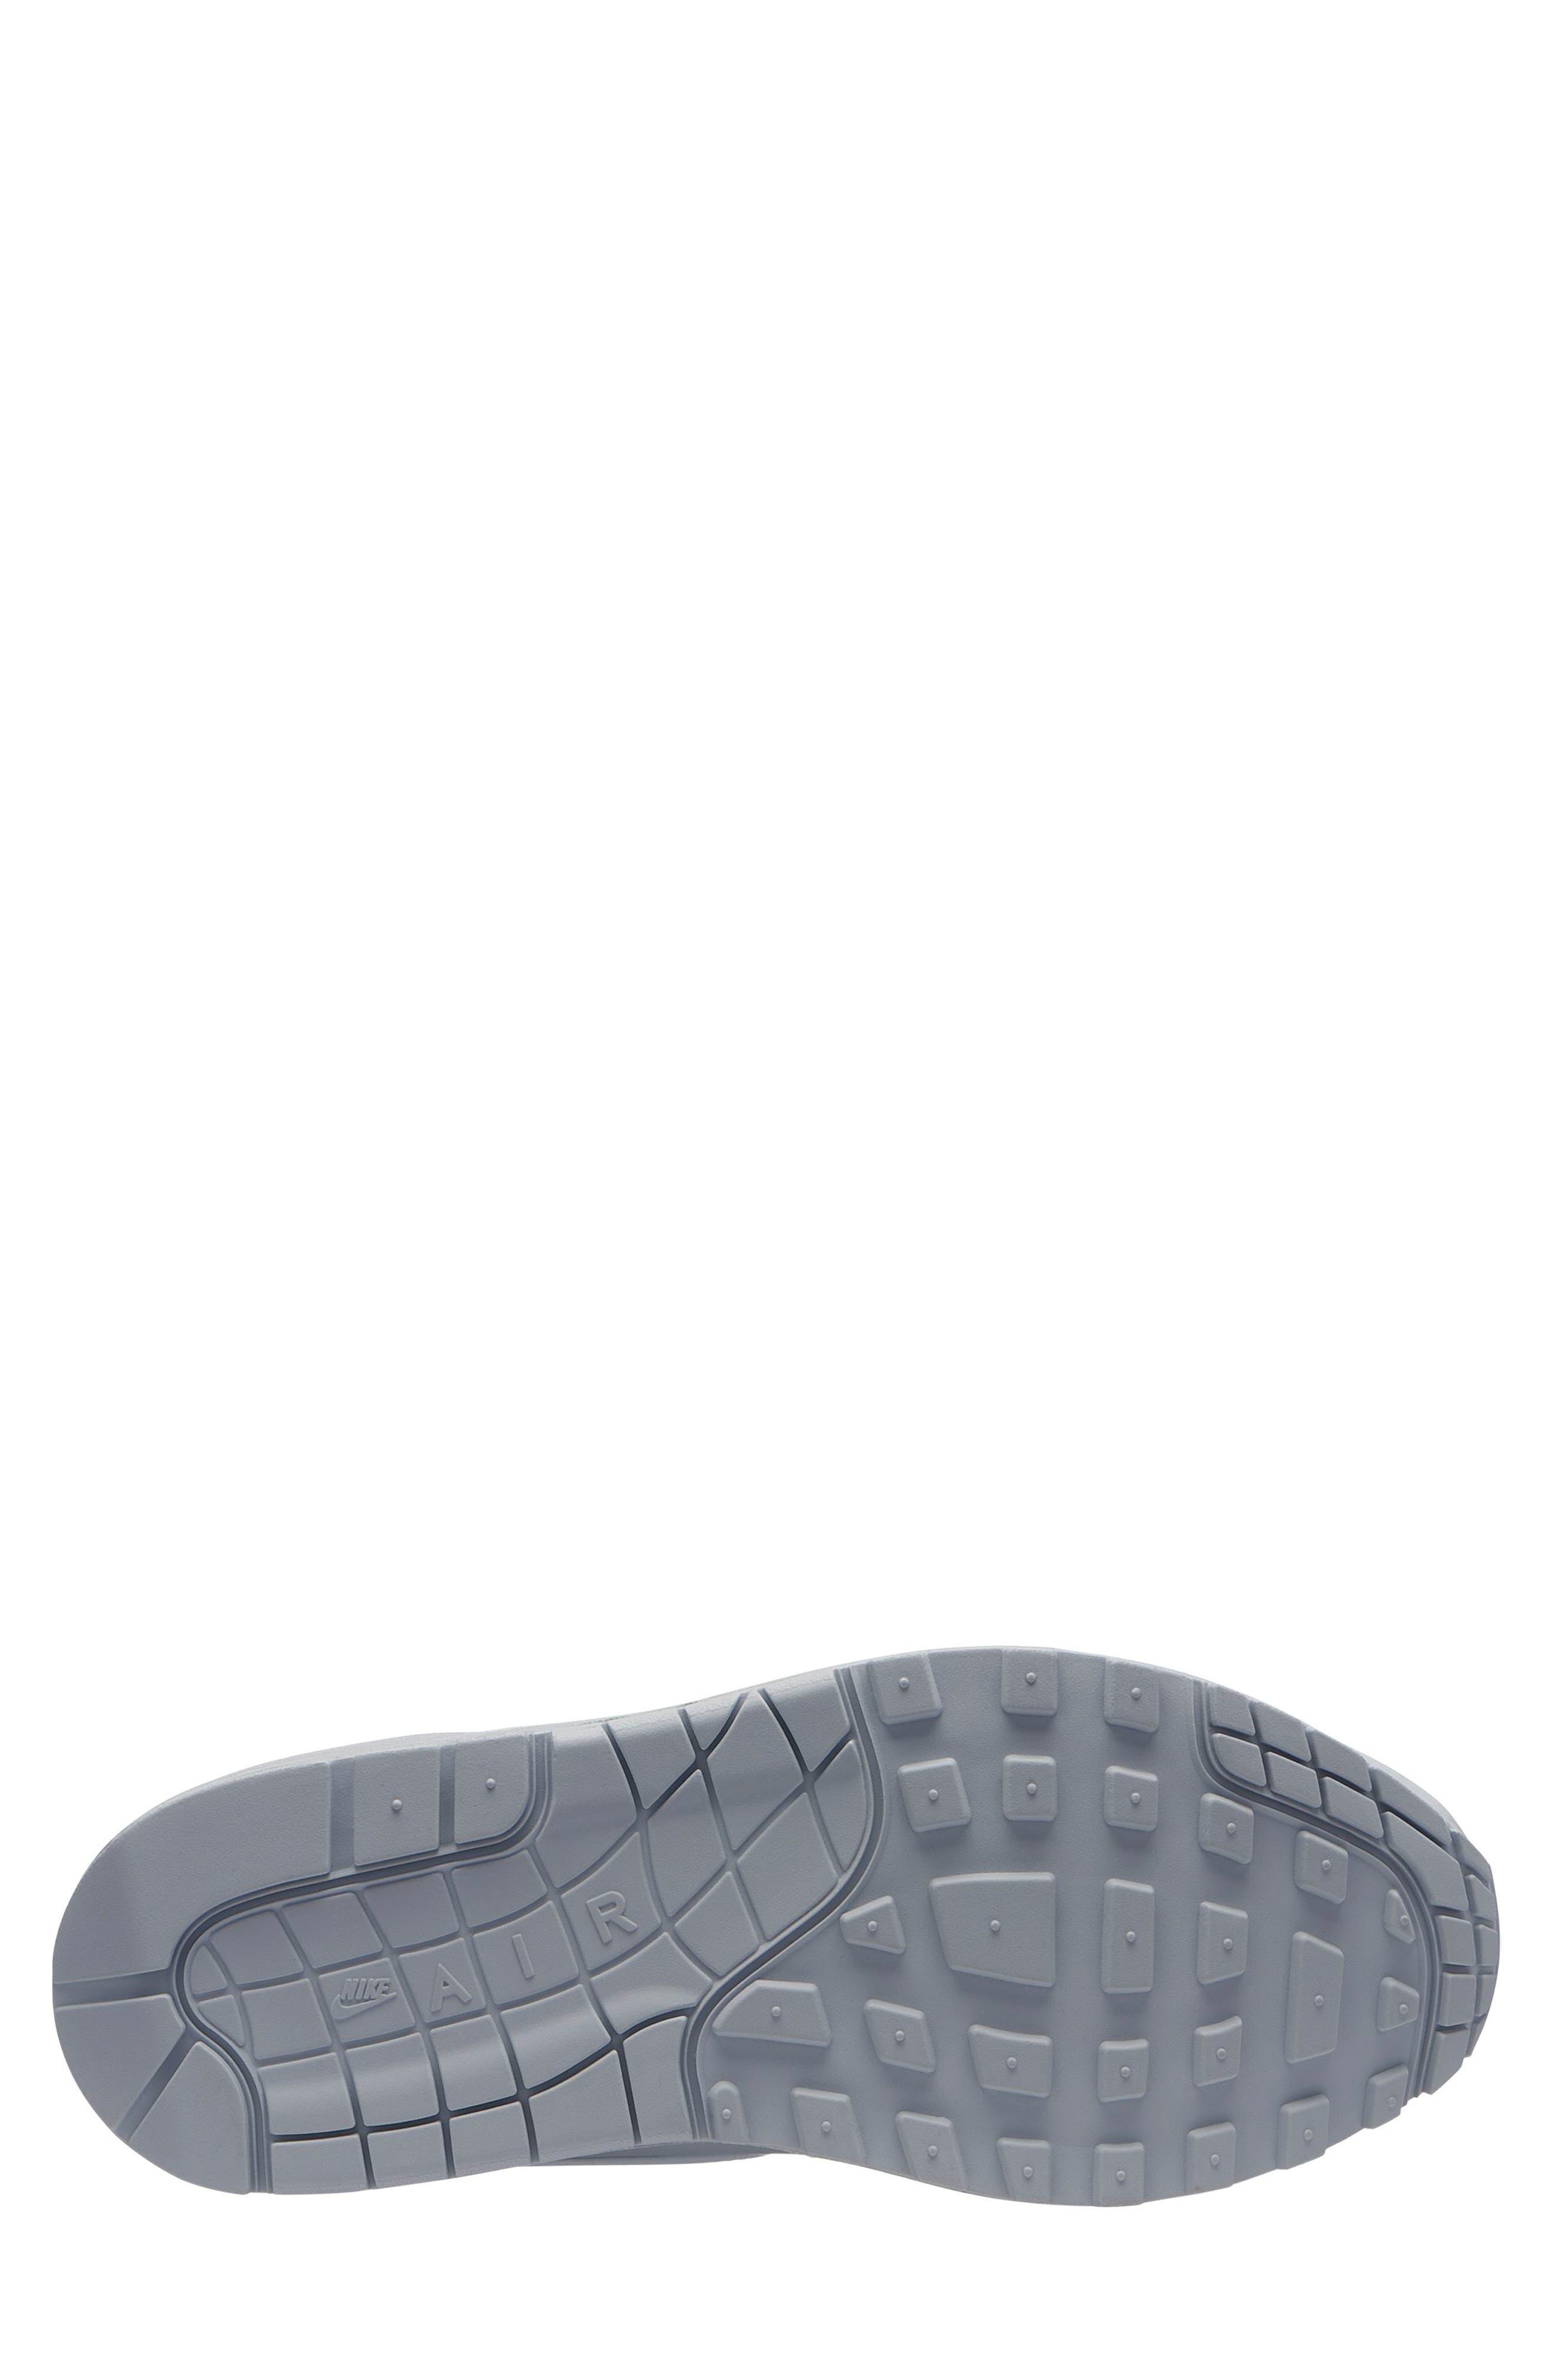 NIKE, Air Max 1 Lux Sneaker, Alternate thumbnail 2, color, PURE PLATINUM/ PURE PLATINUM